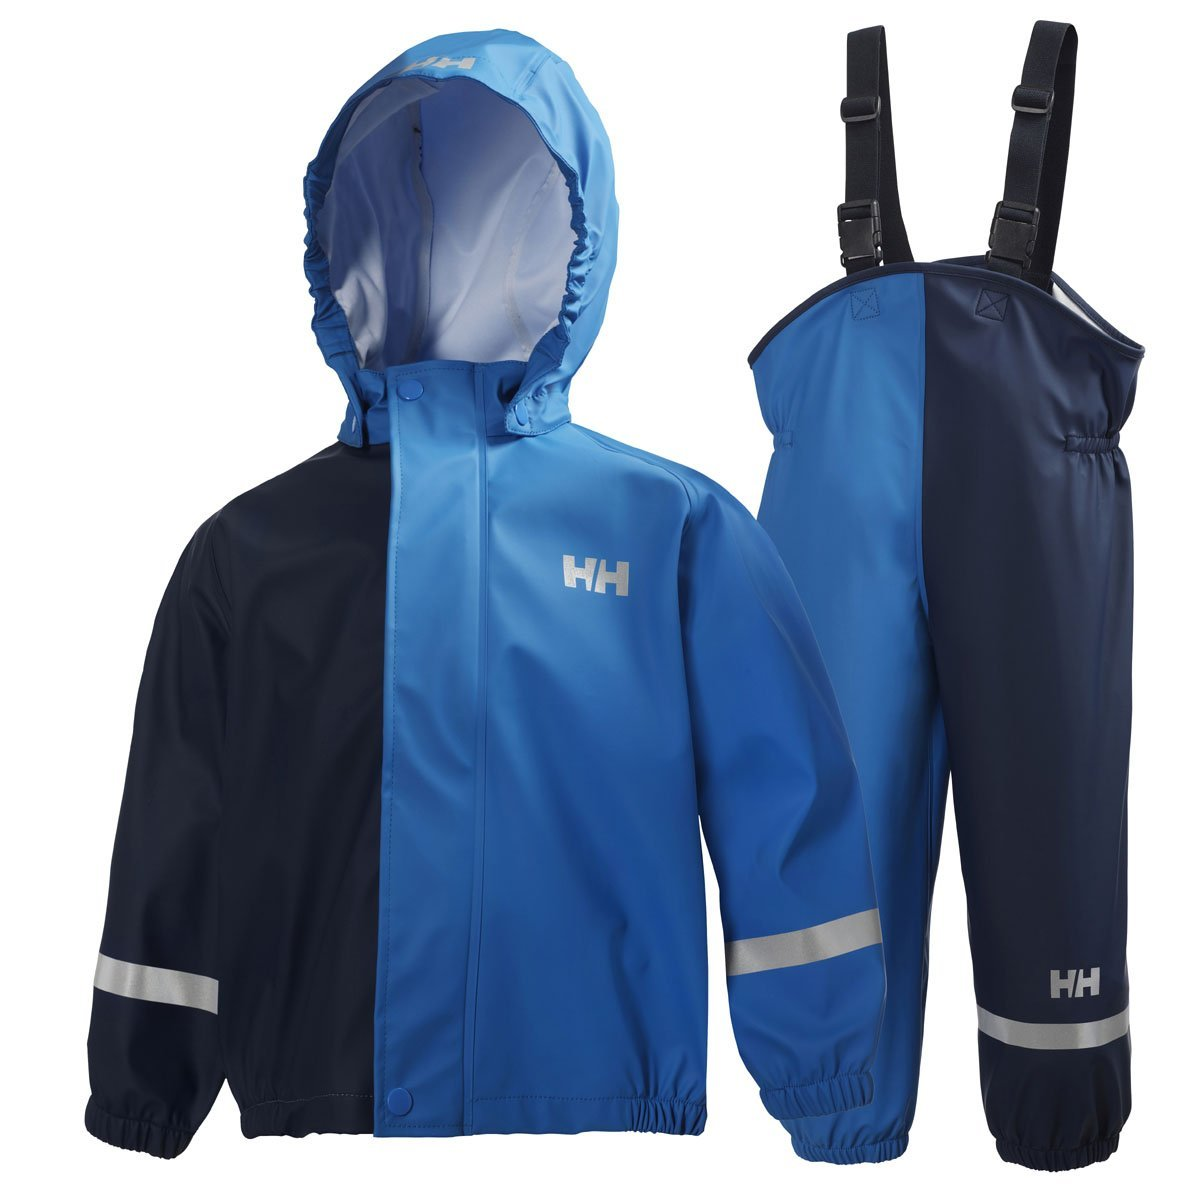 Helly Hansen 2015/16 Kid's K Voss Rainset Jacket and Pants - 43141